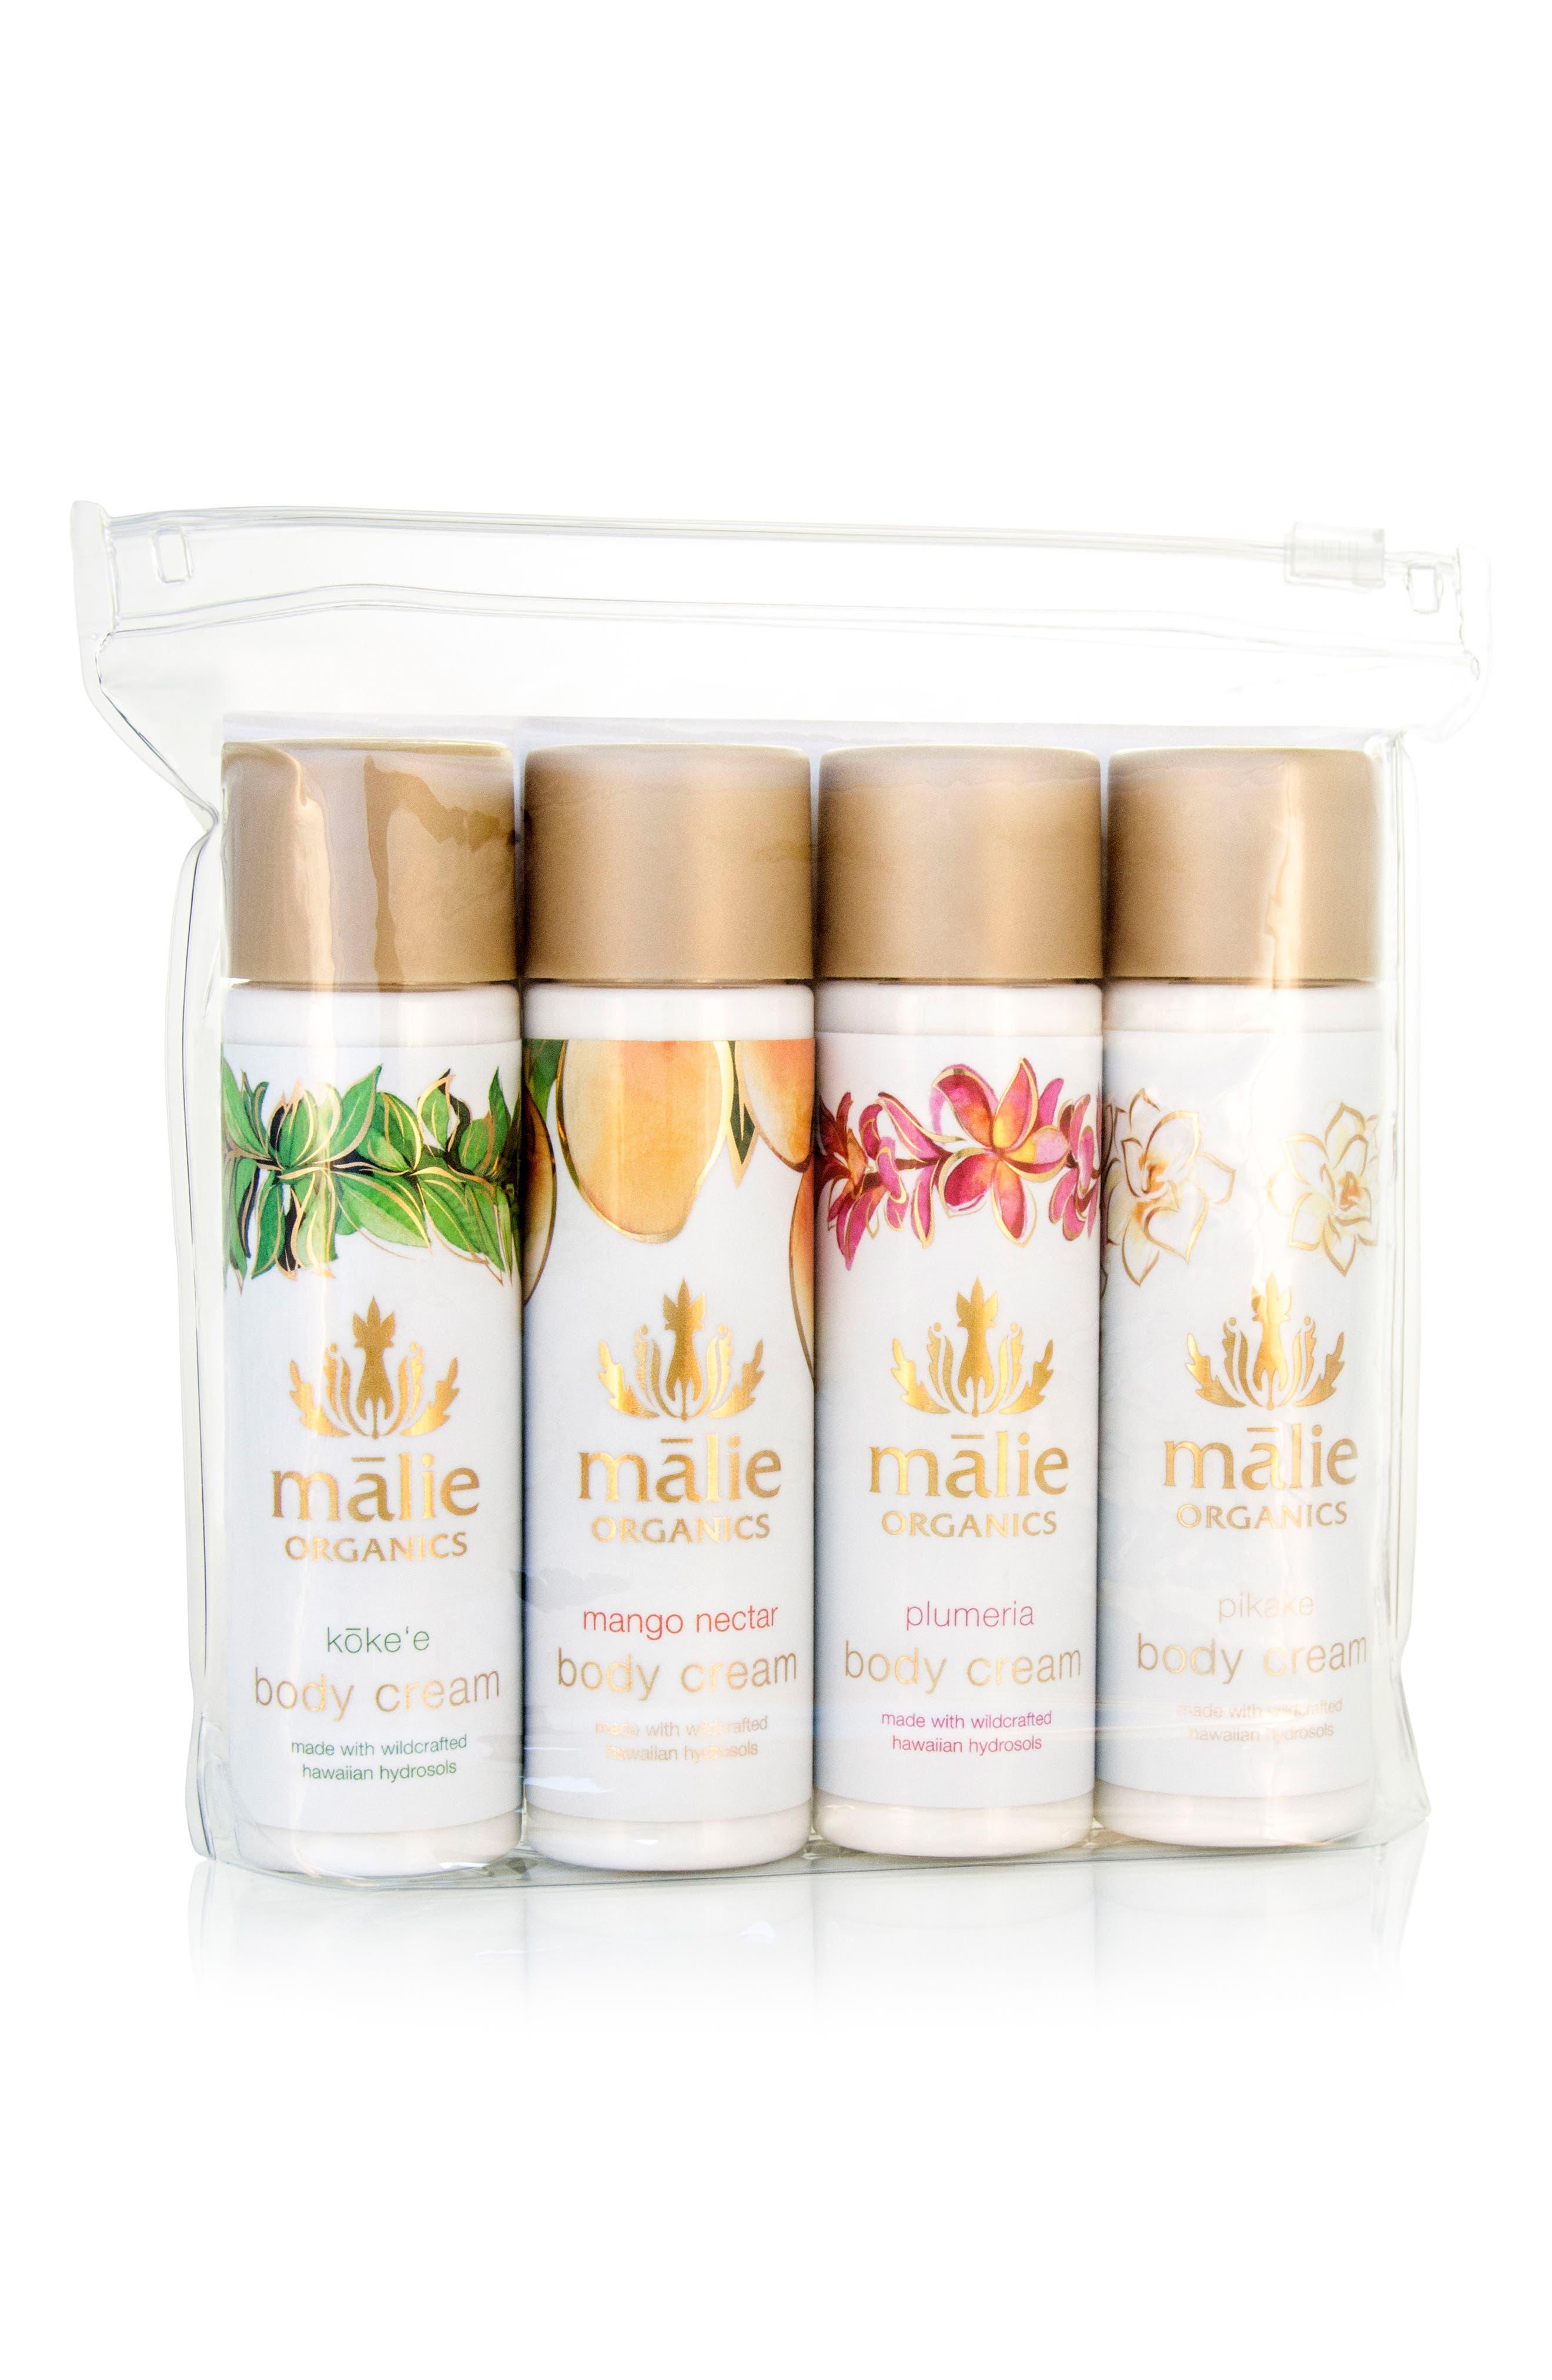 Malie Organics Body Cream Set ($64 Value)